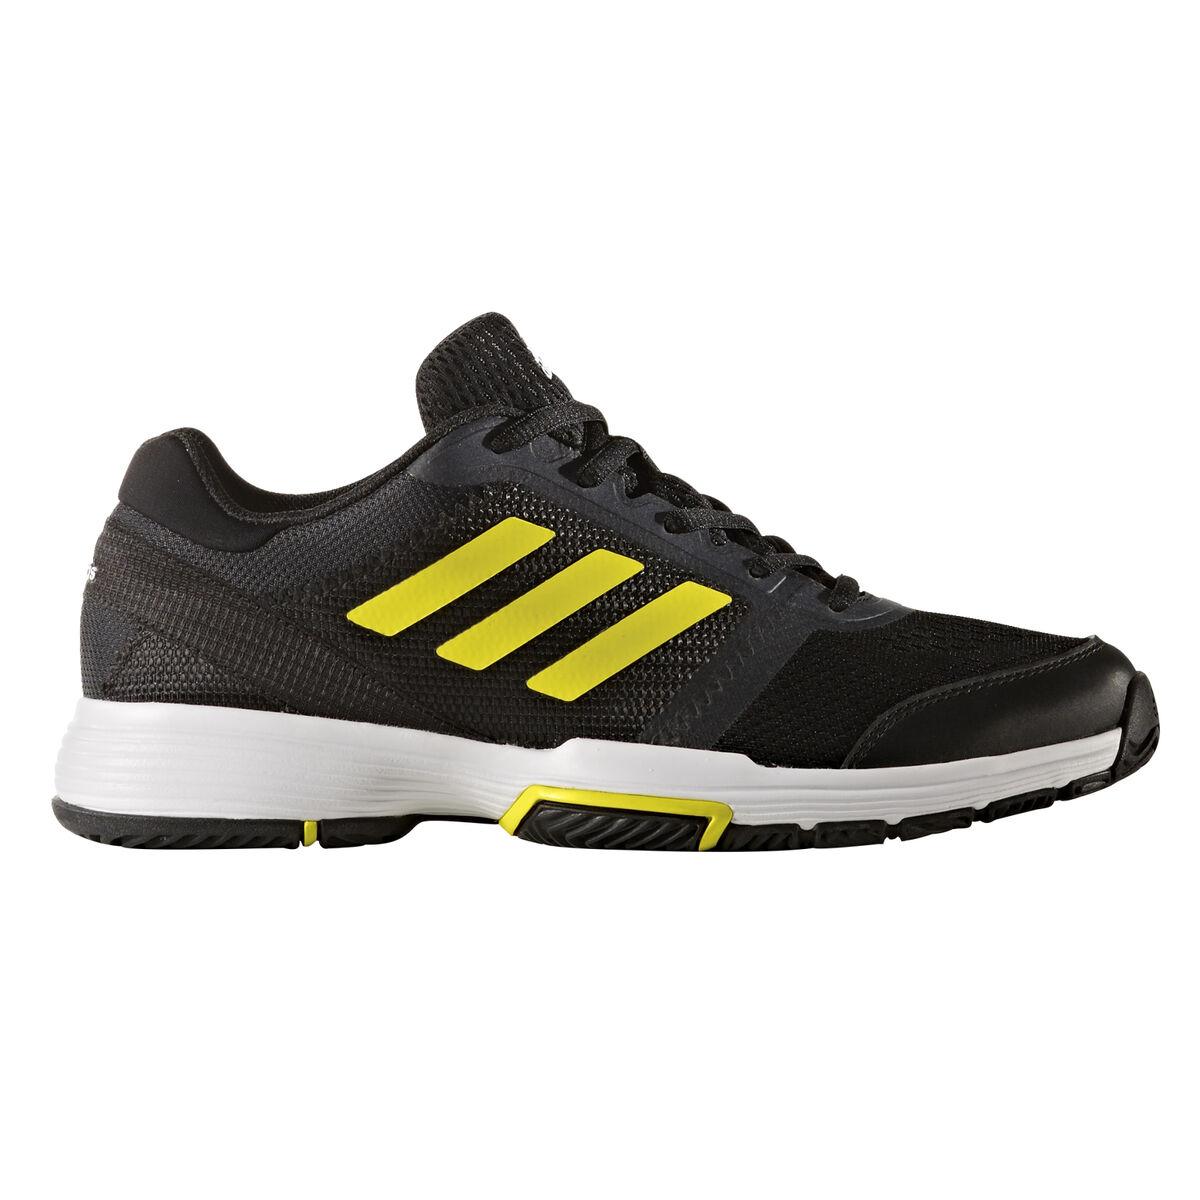 14bf5b07323ad3 Images. adidas Barricade Club Women  39 s Tennis Shoe - Black Yellow